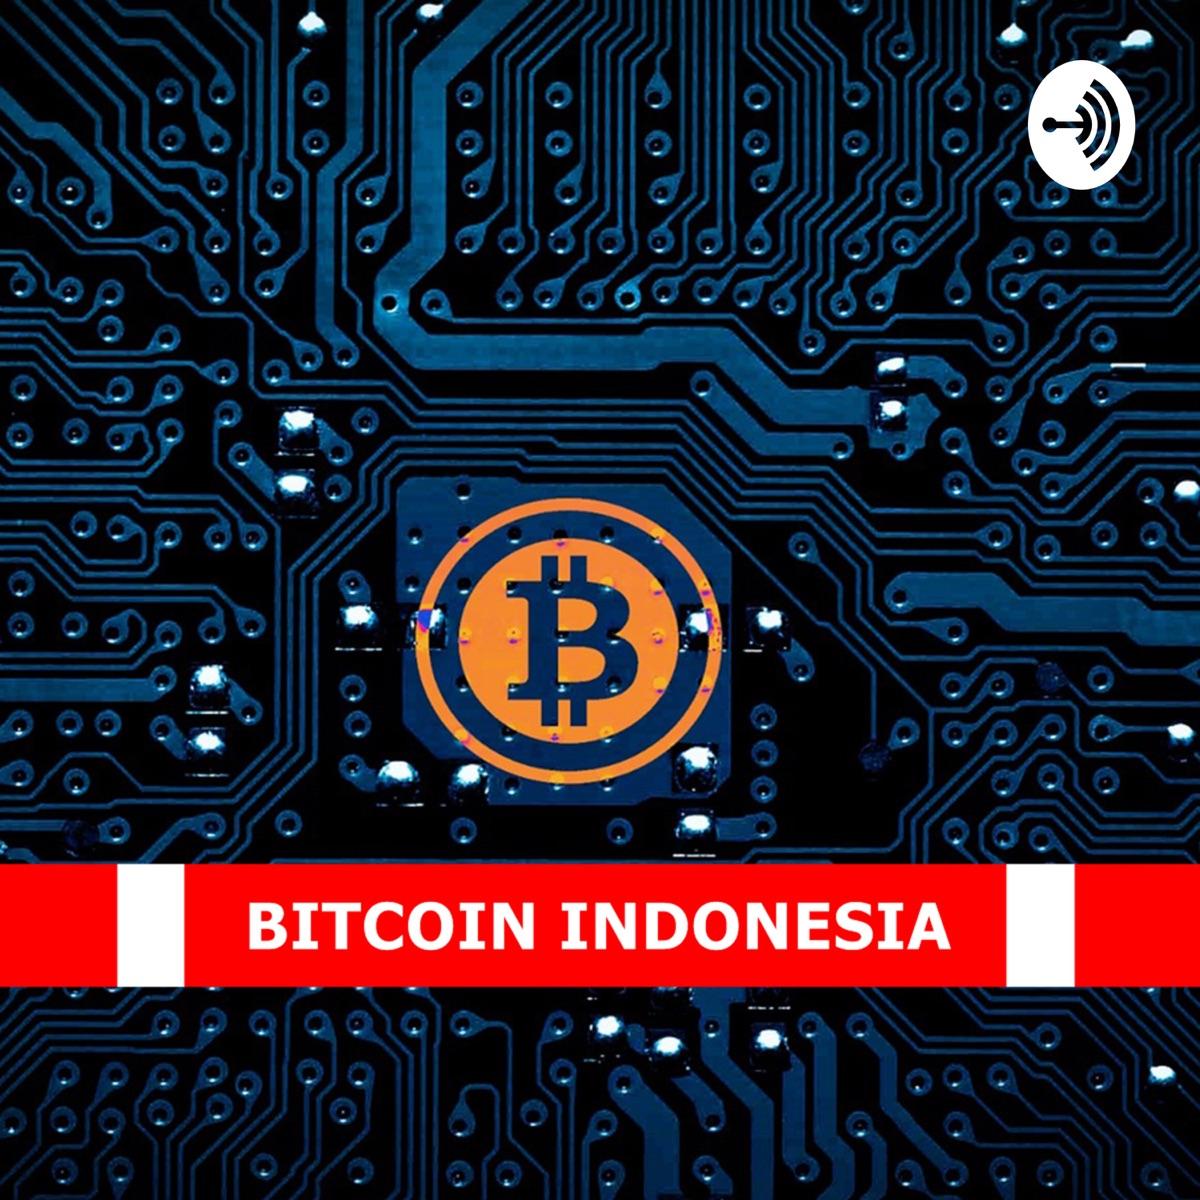 belajar trading bitcoin untuk pemul dă- mi btc